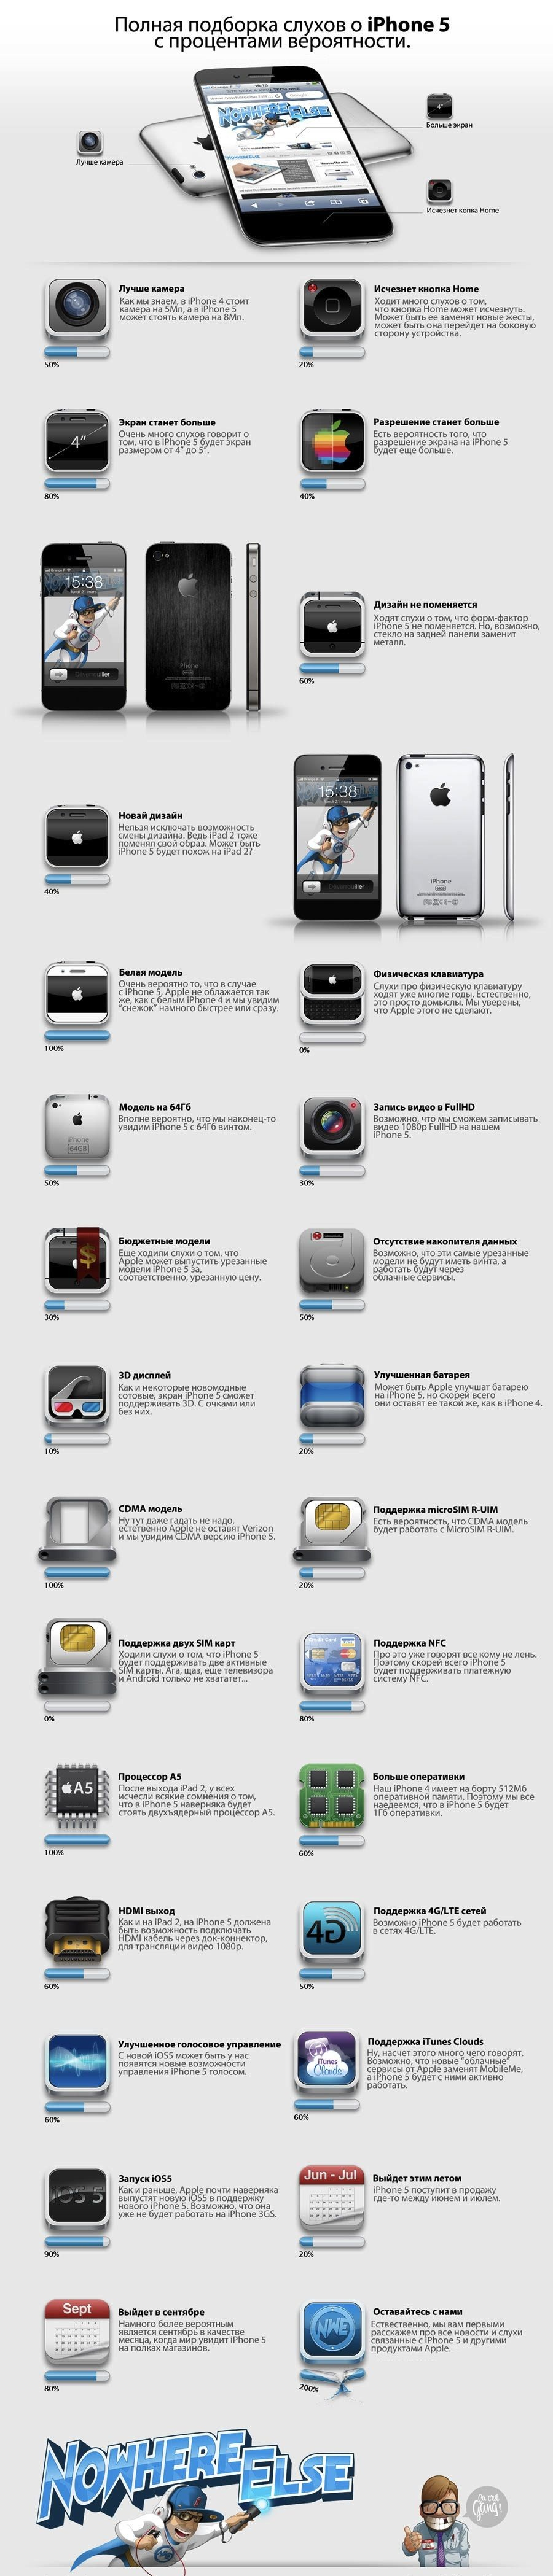 Все слухи об iPhone 5 в одном месте